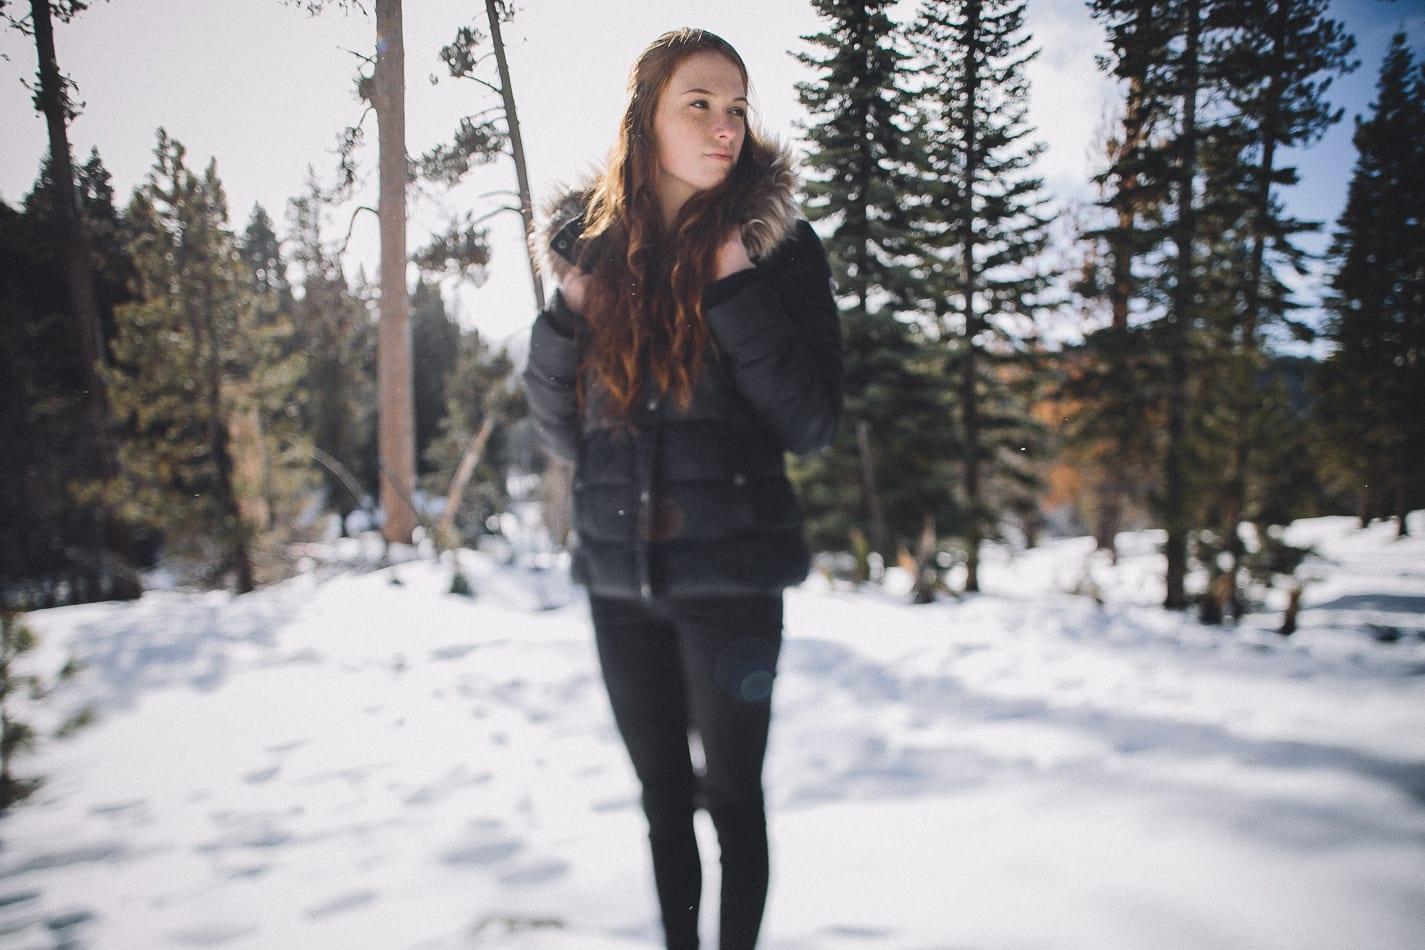 mount-lassen-winter-portrait-photo-2